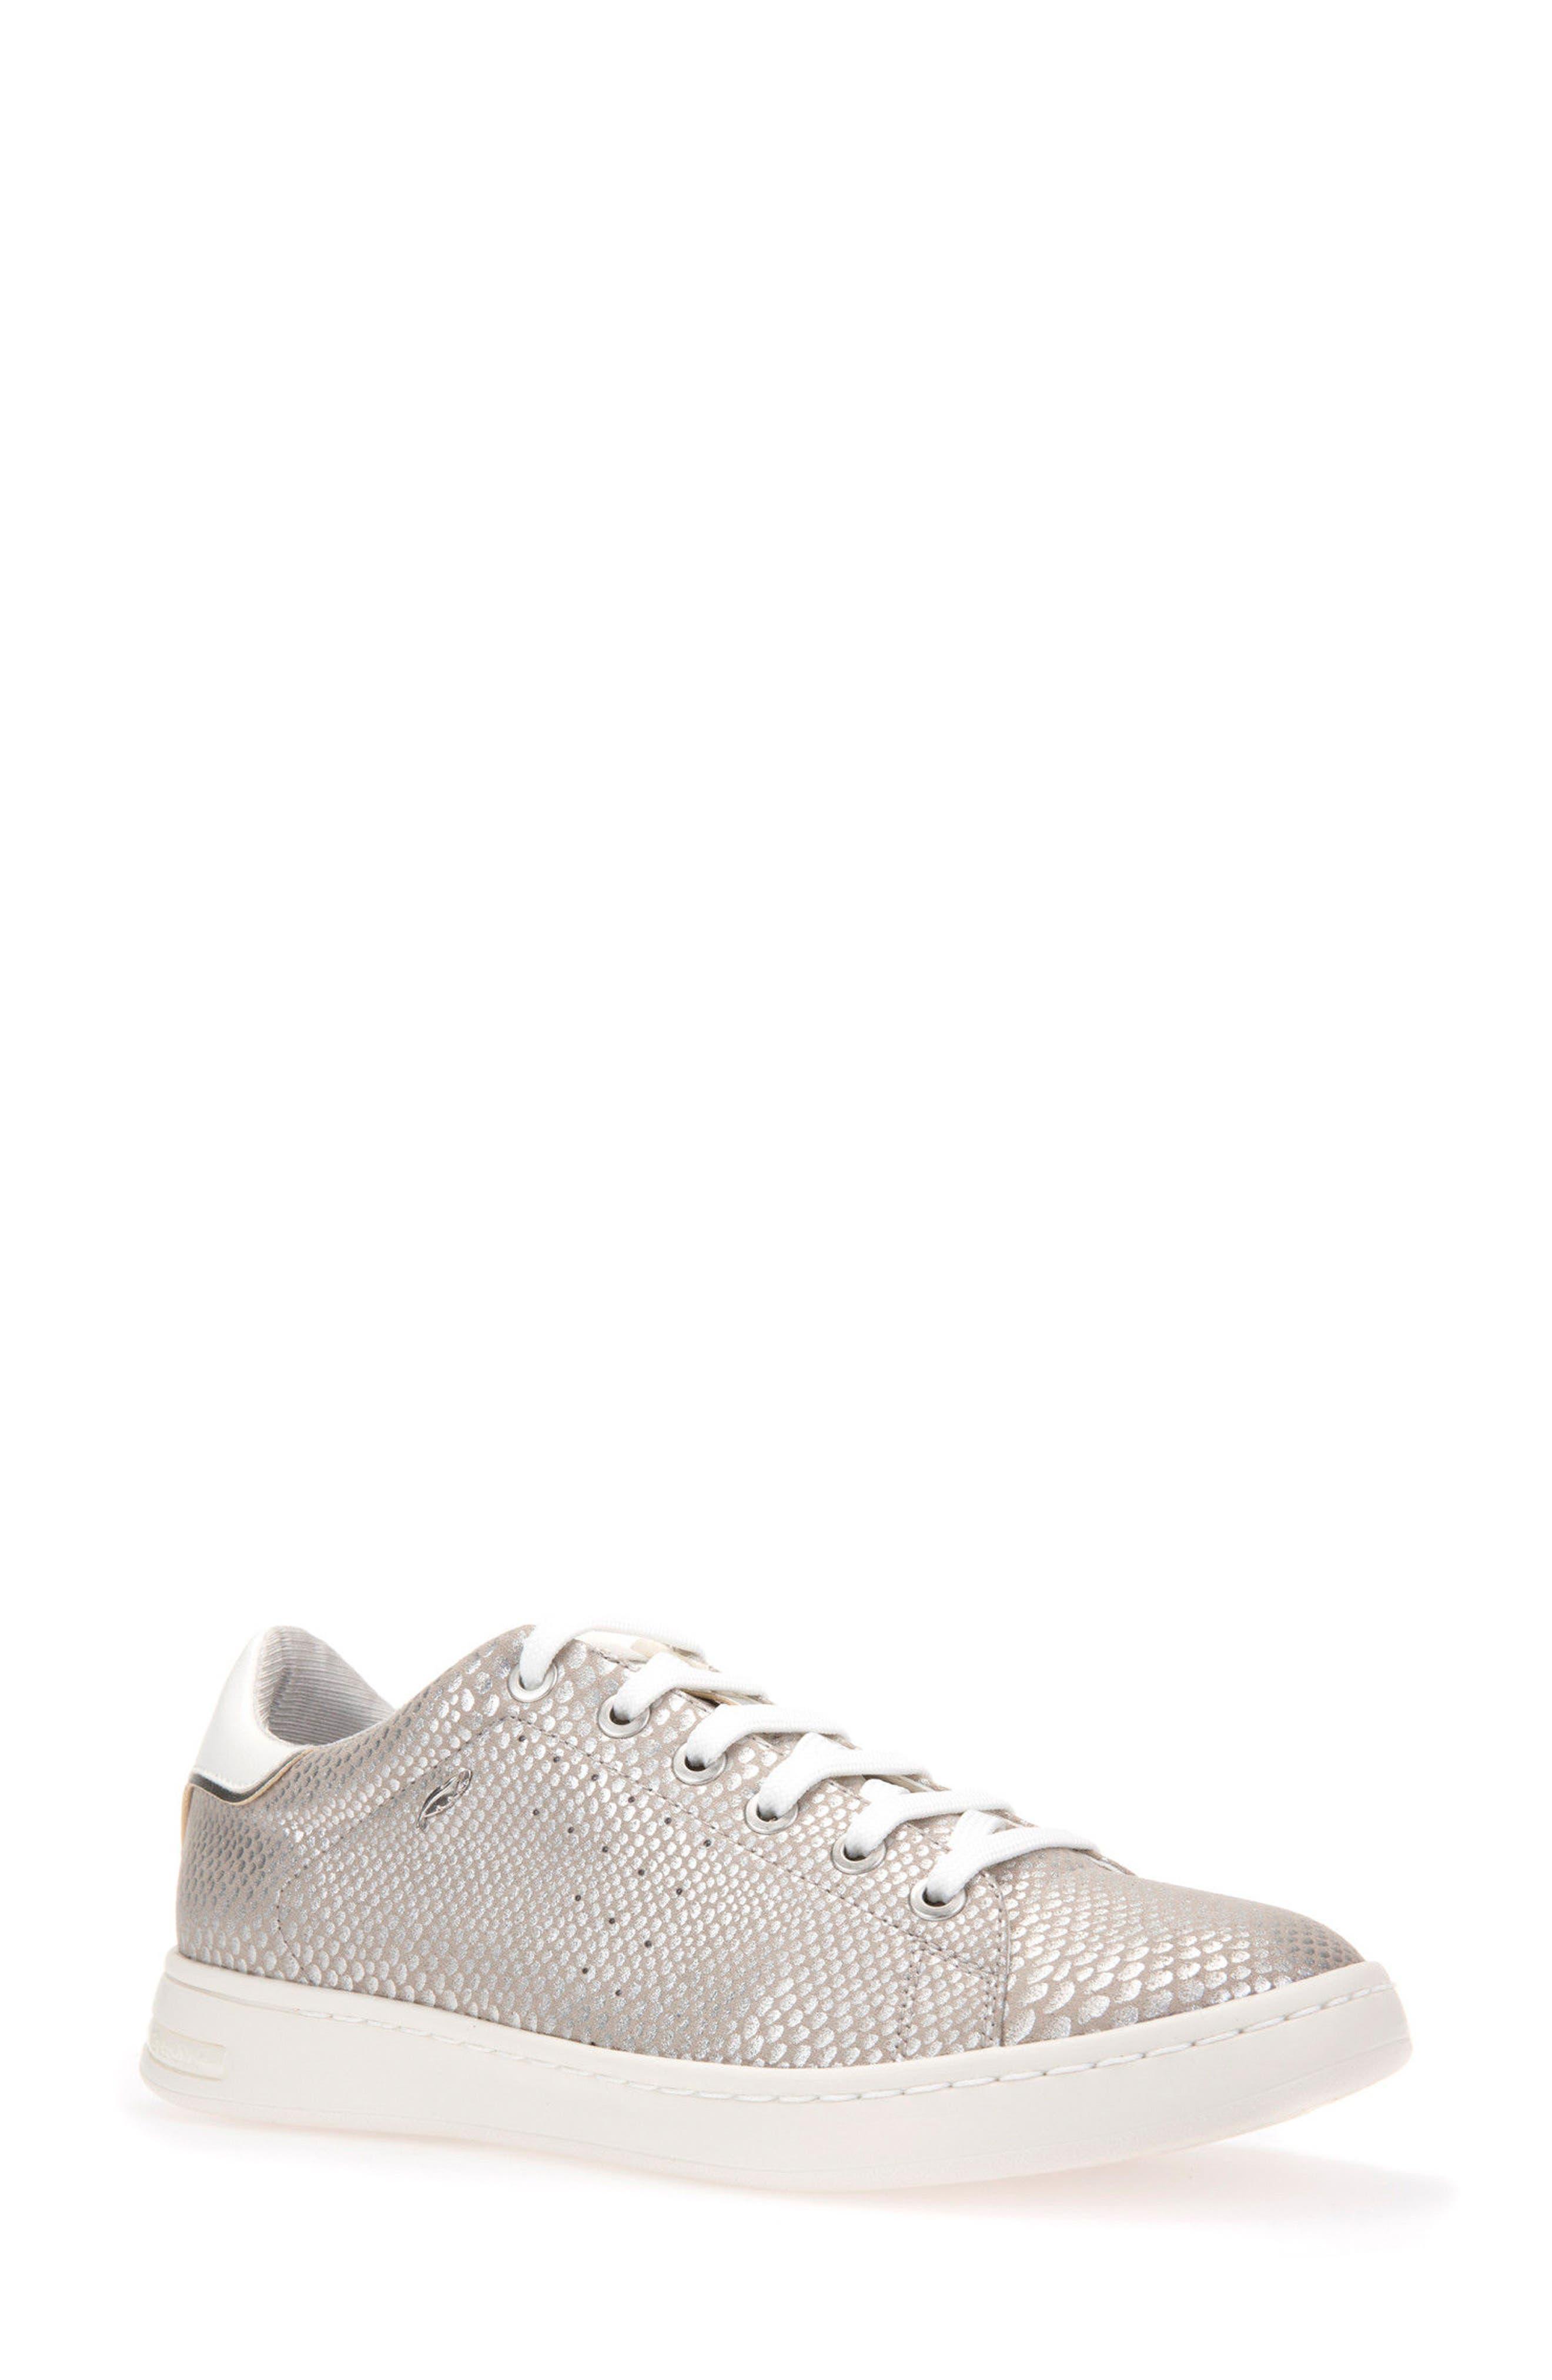 Jaysen Sneaker,                             Main thumbnail 1, color,                             040